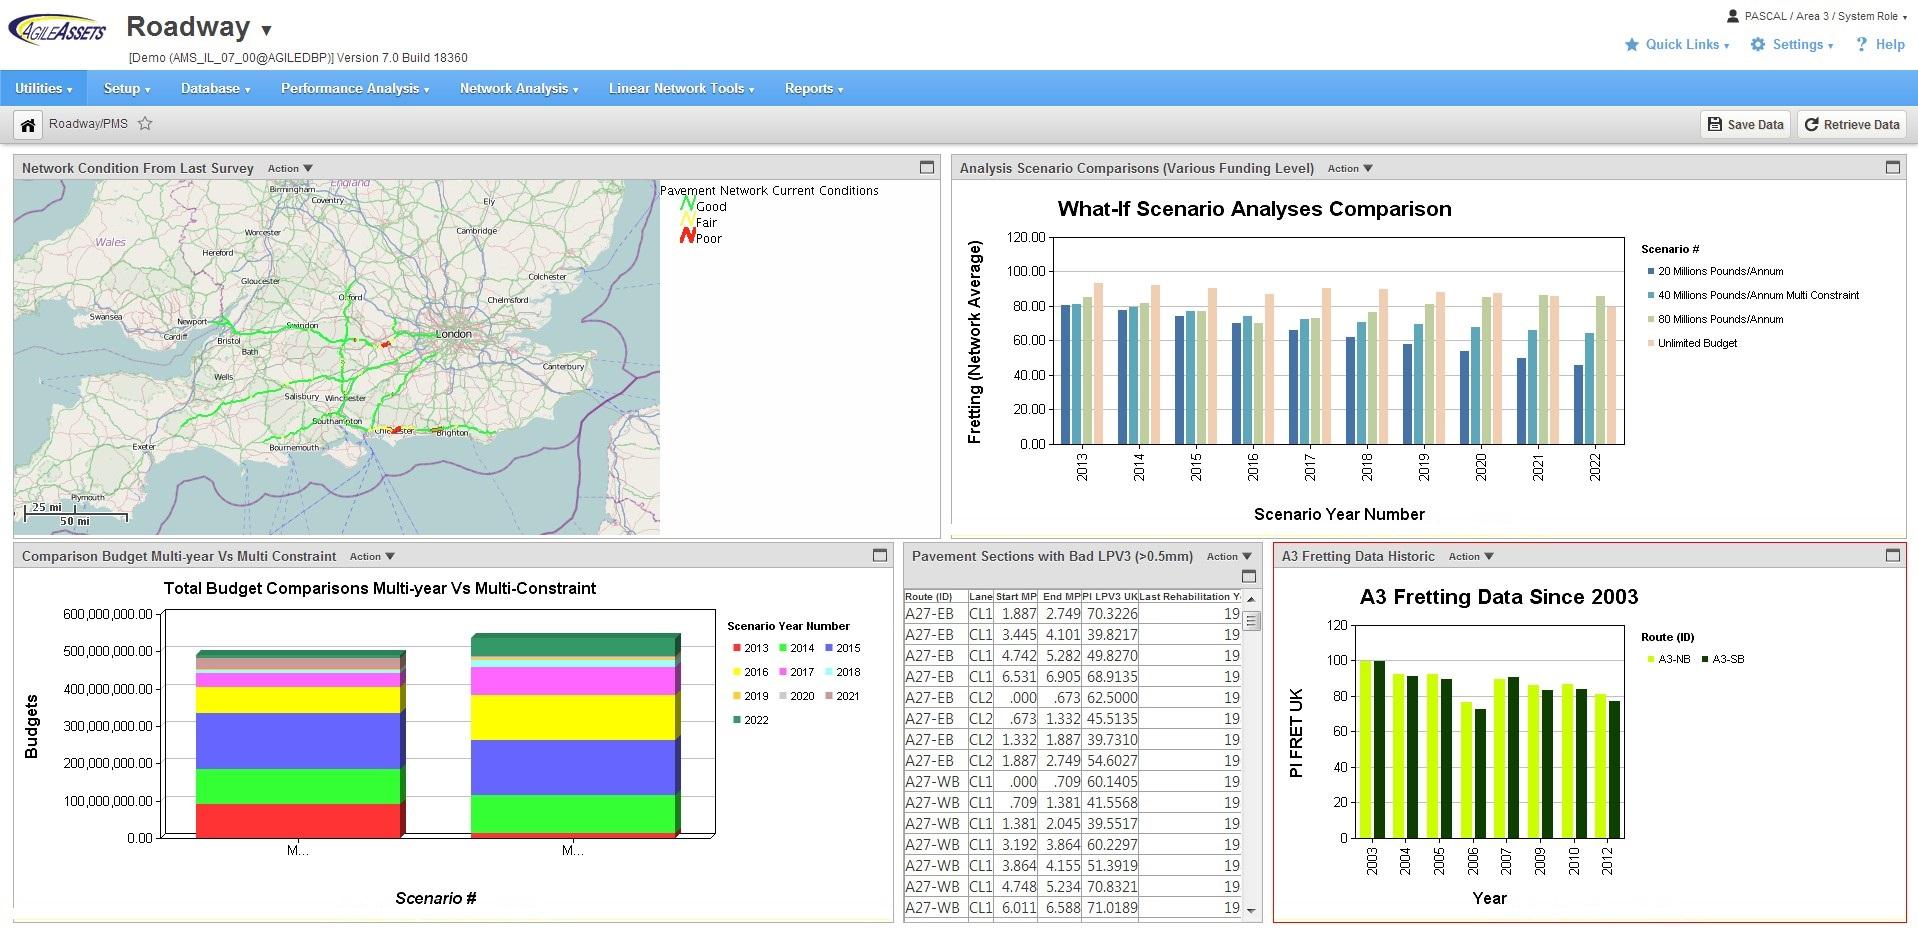 AgileAssets Software - Roadway dashboard